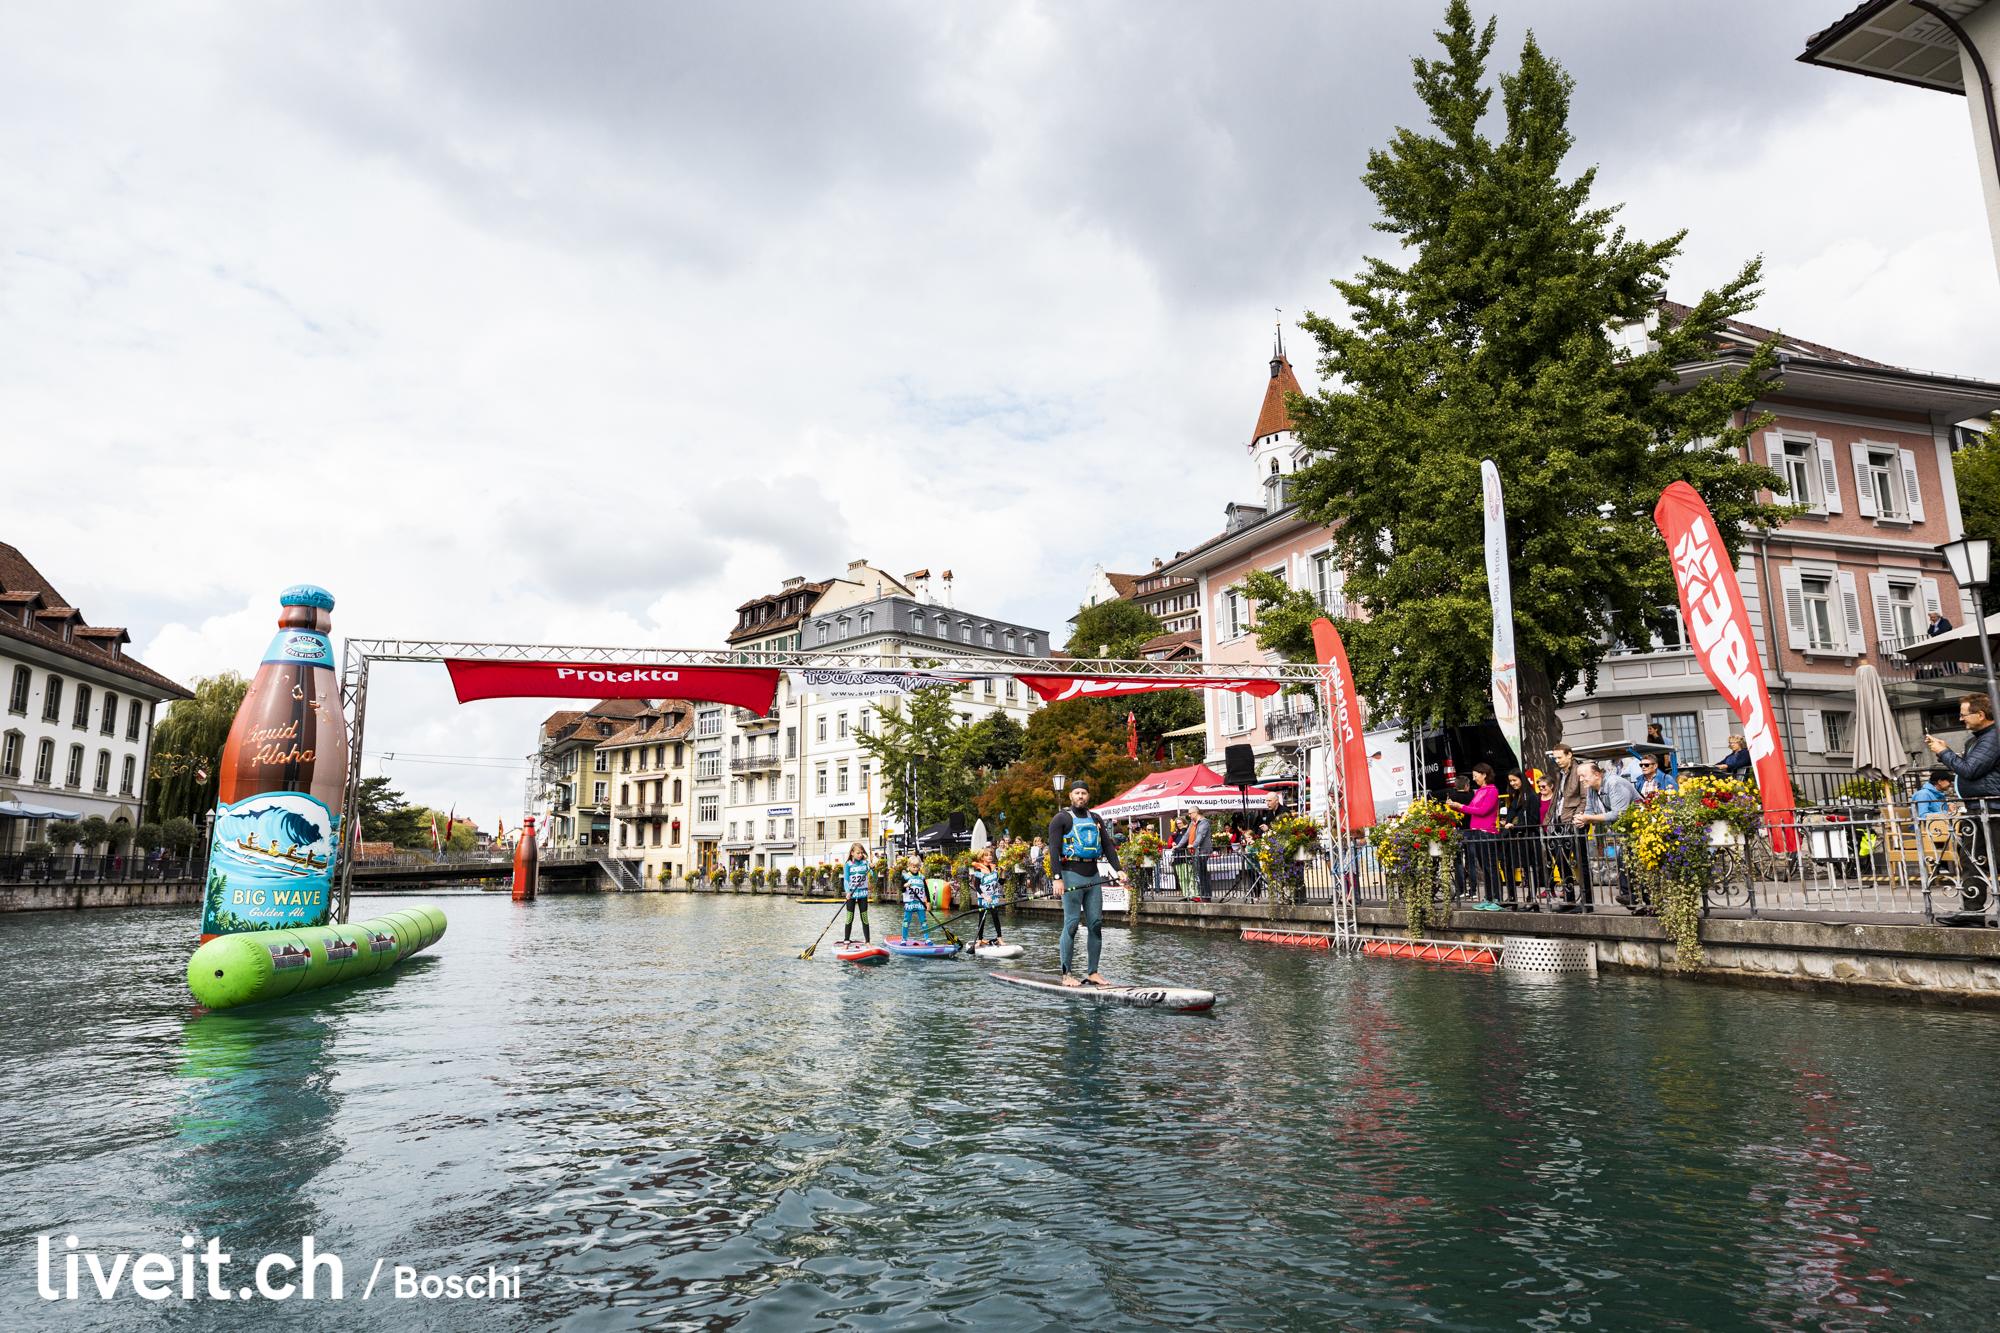 SUPTourSchweiz Thunersee 2019 am Aarequai in Thun(liveit.ch/boschi)